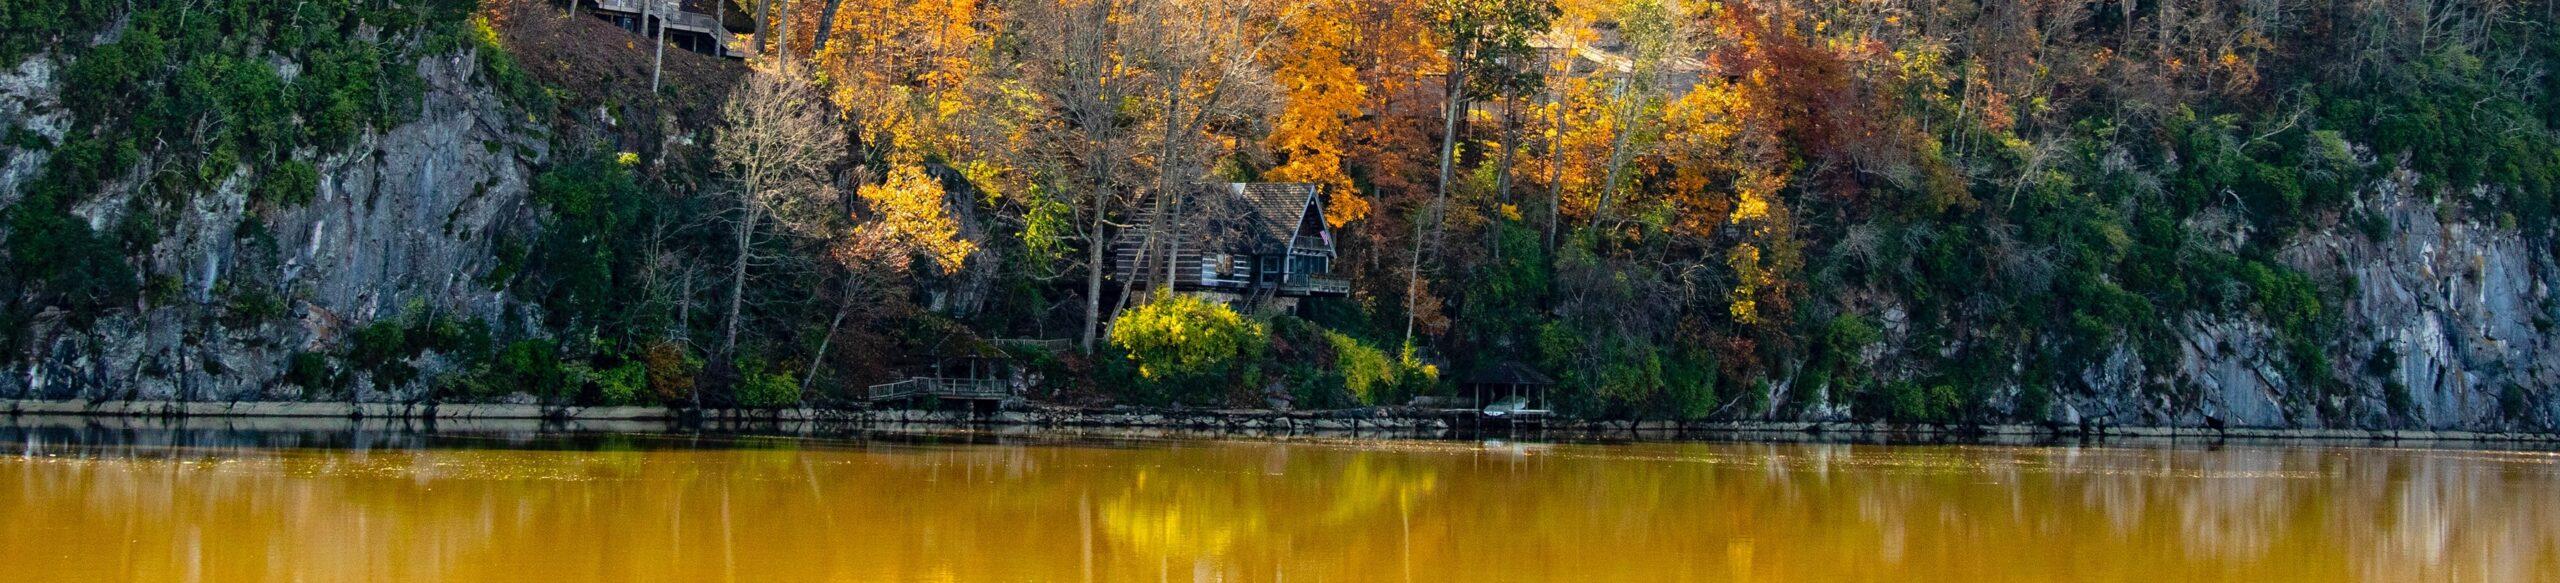 Ноксвилл, штат Теннесси